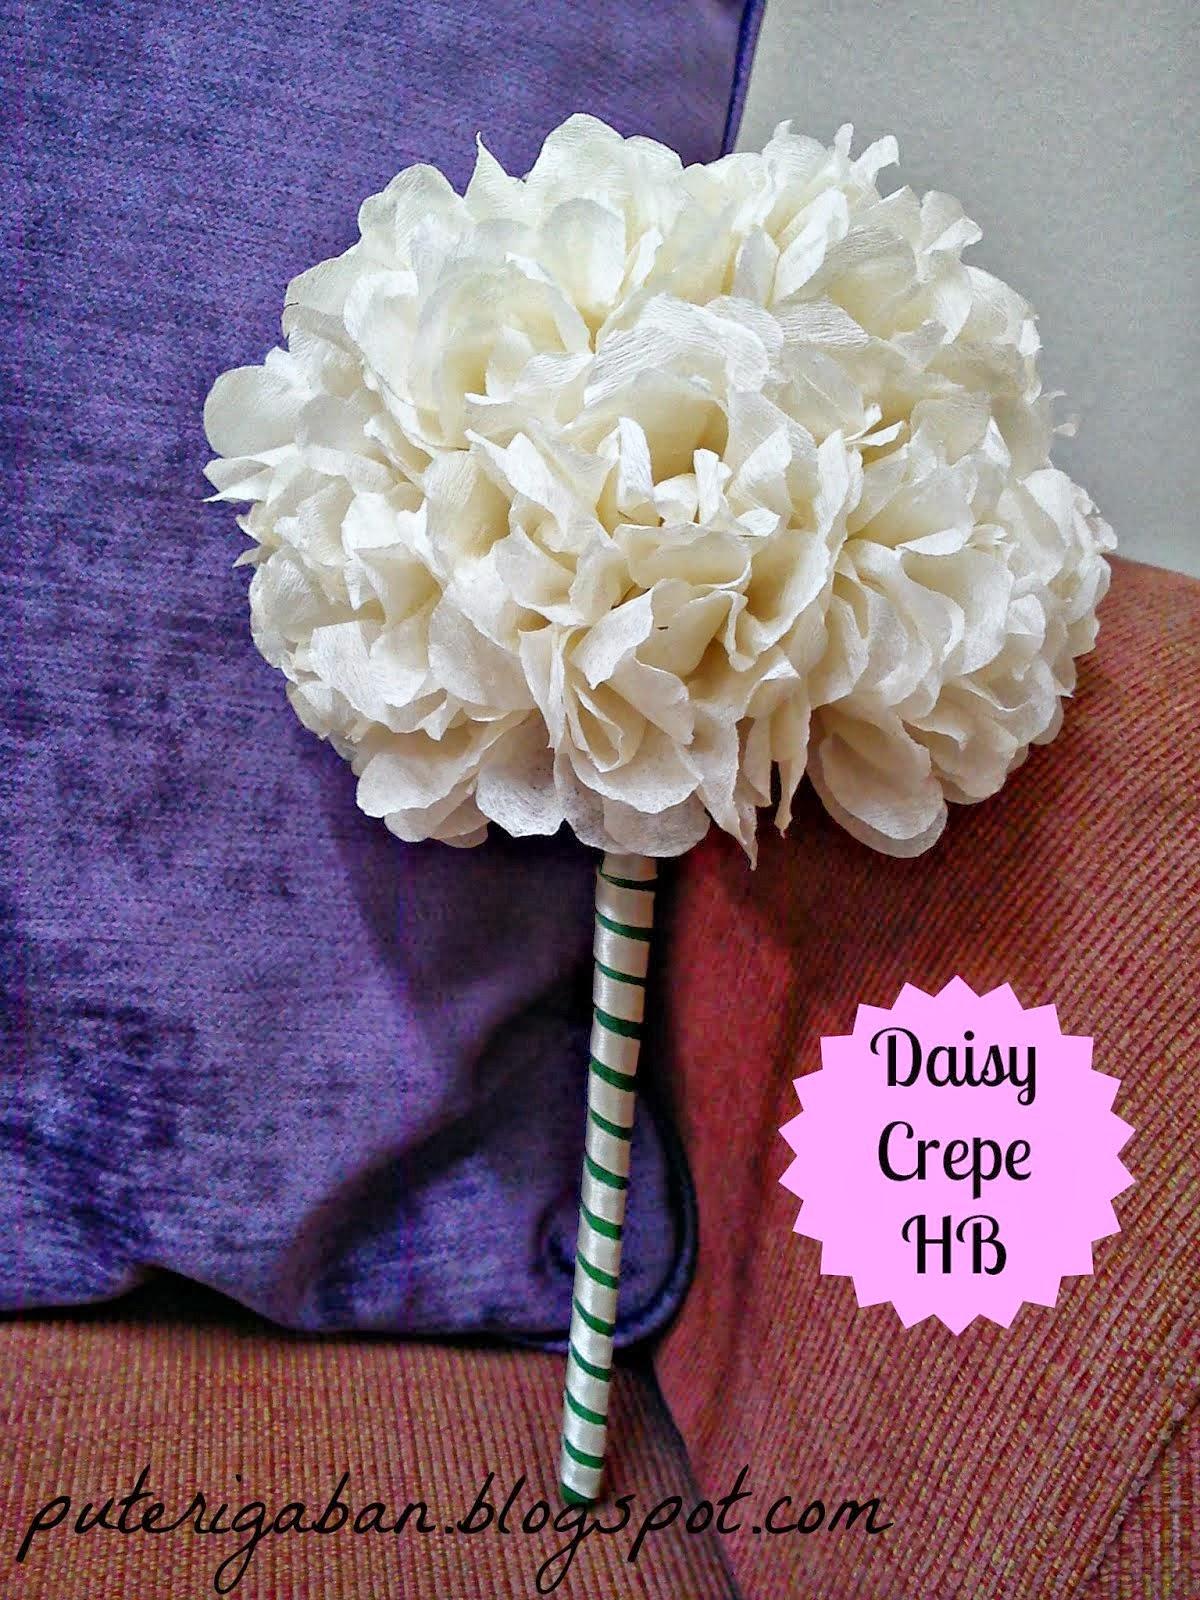 Daisy Crepe HB